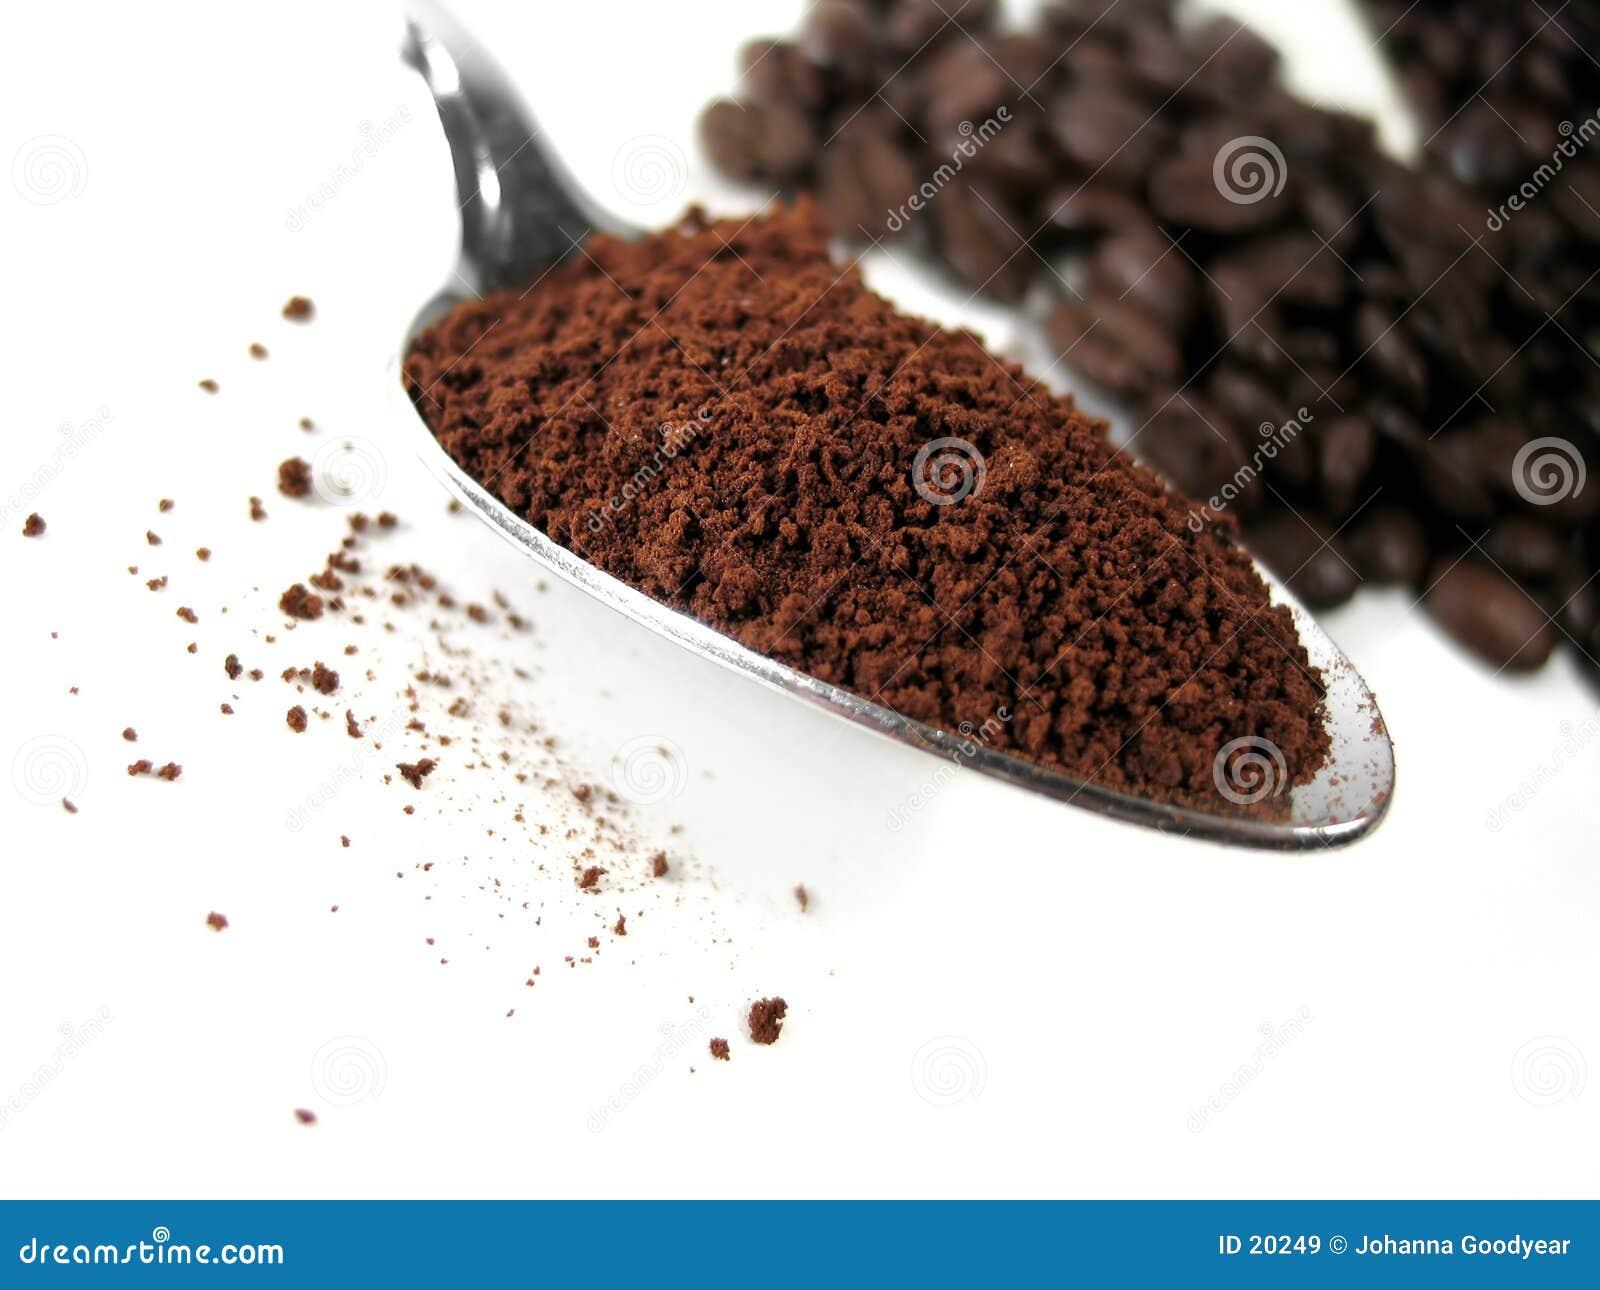 7 kaffeserie